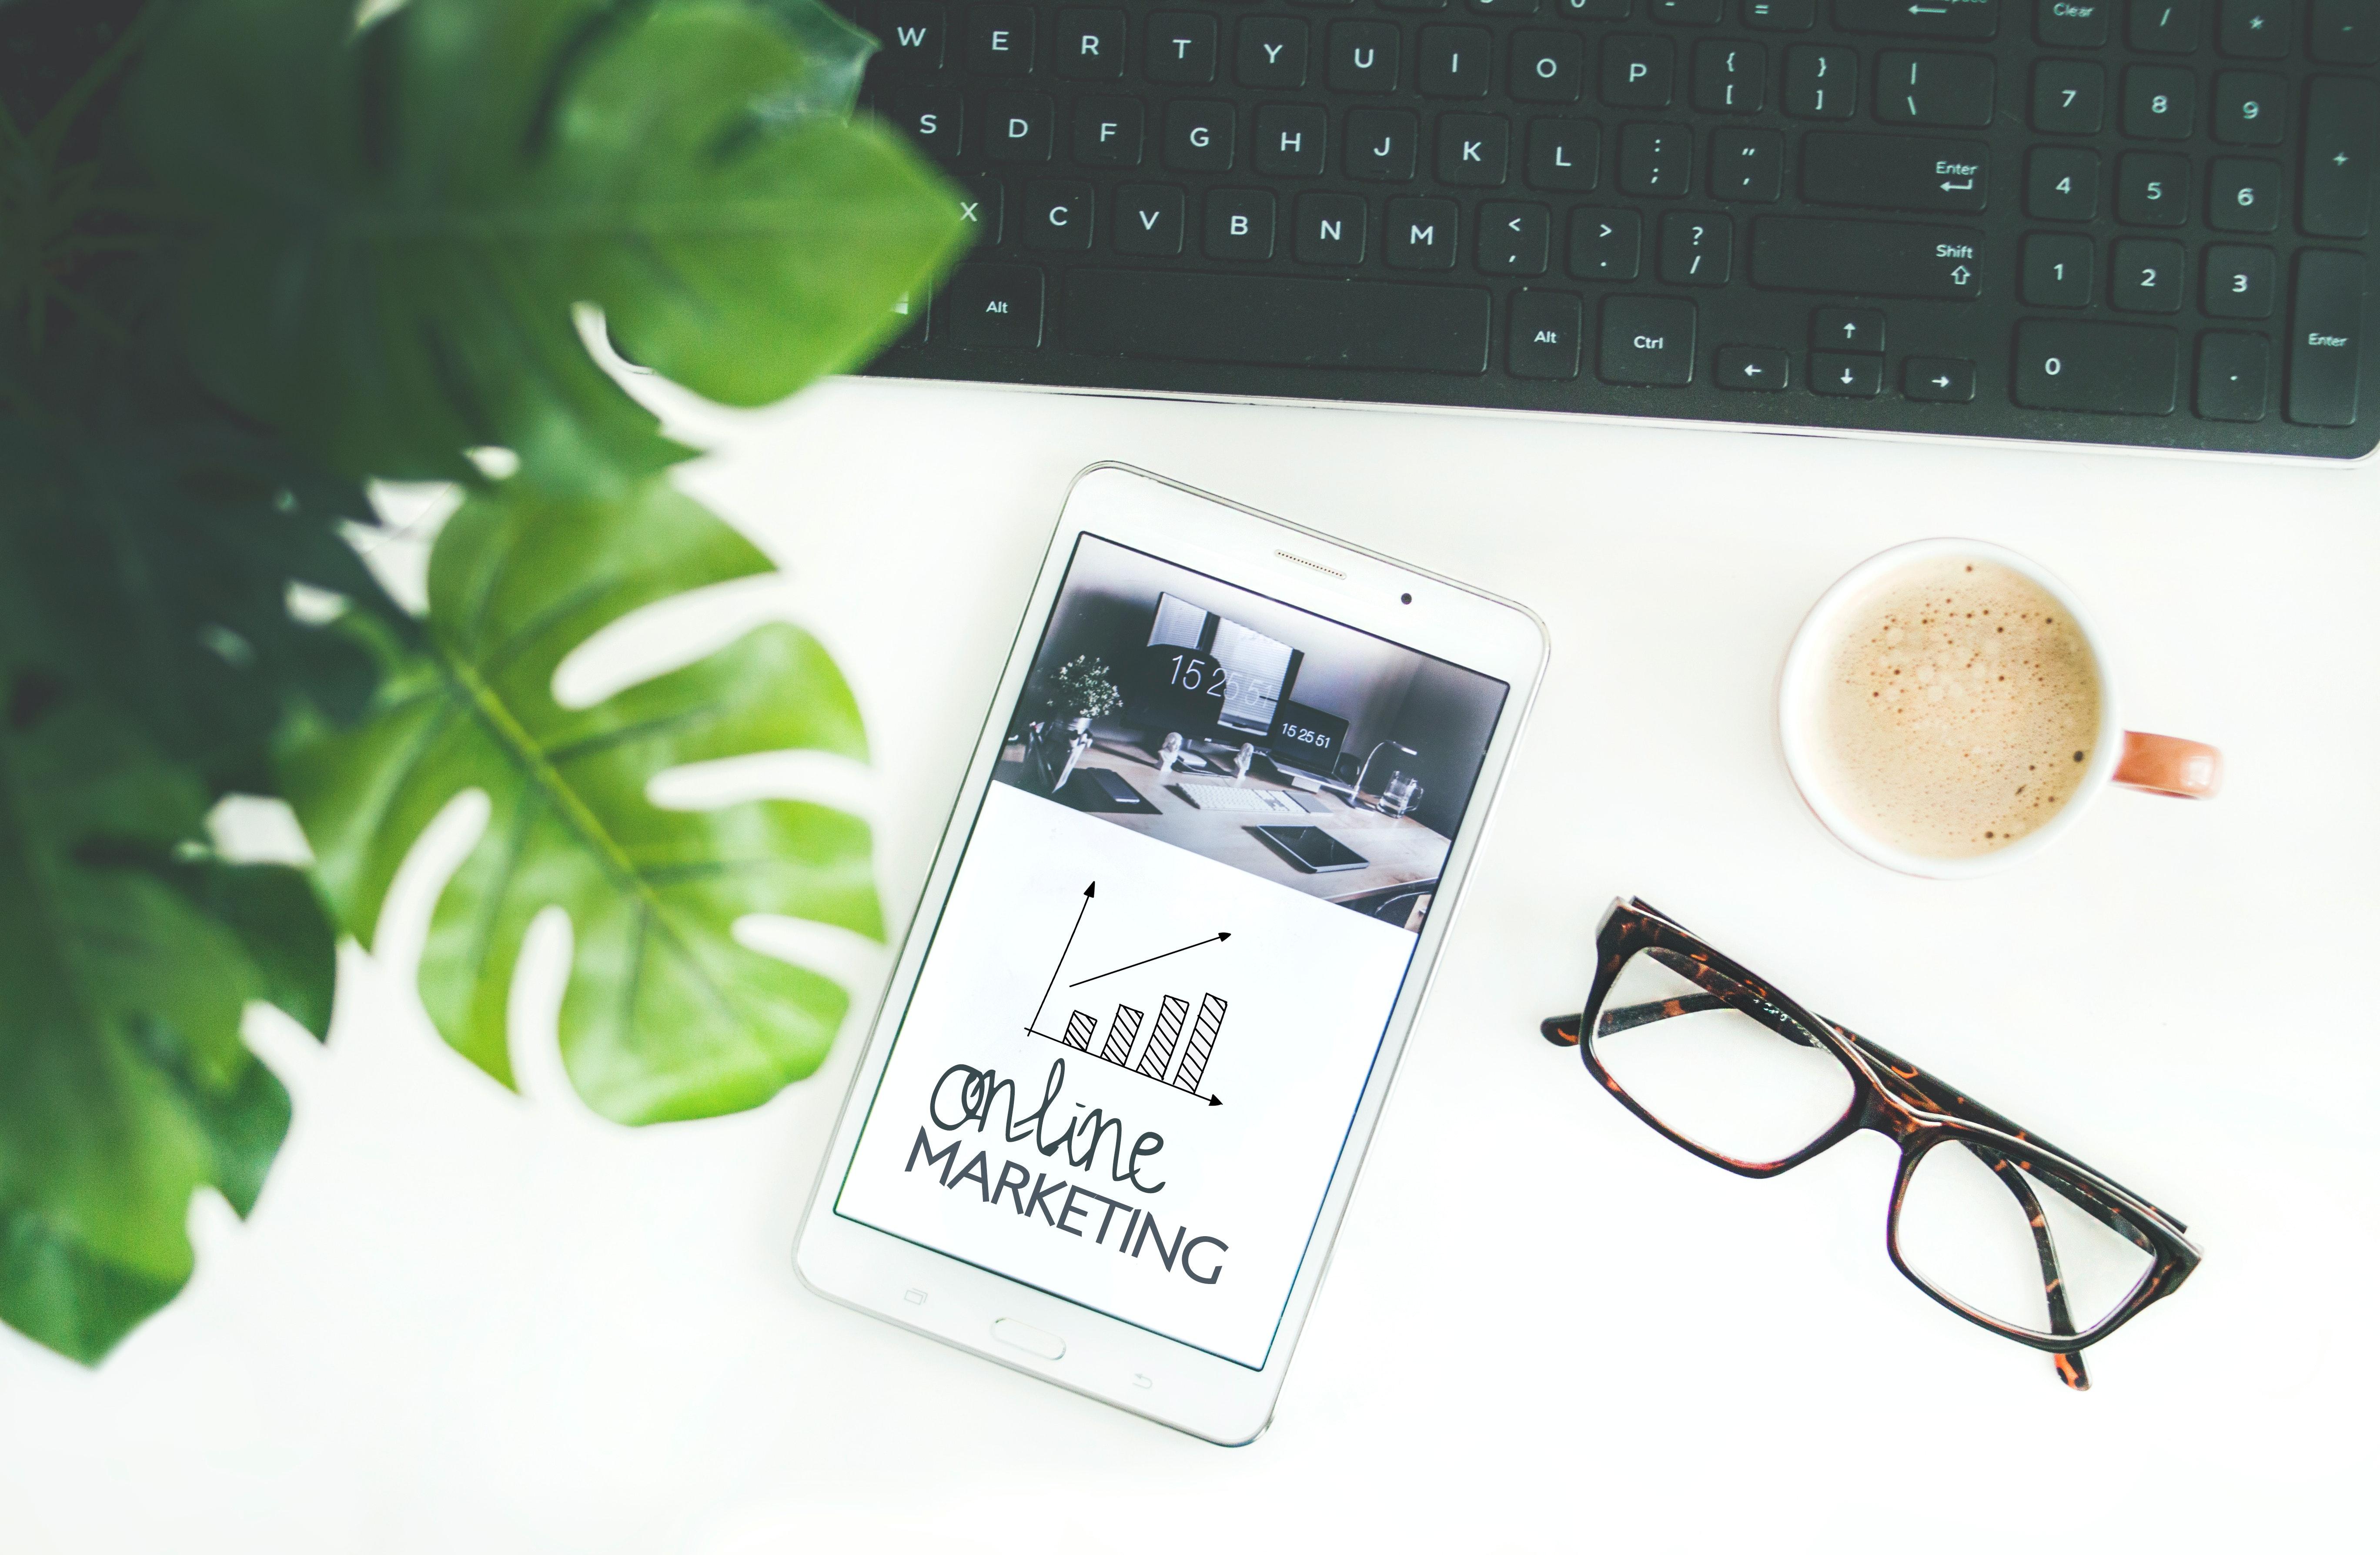 Training & Education Business for Digital Marketing Agencies